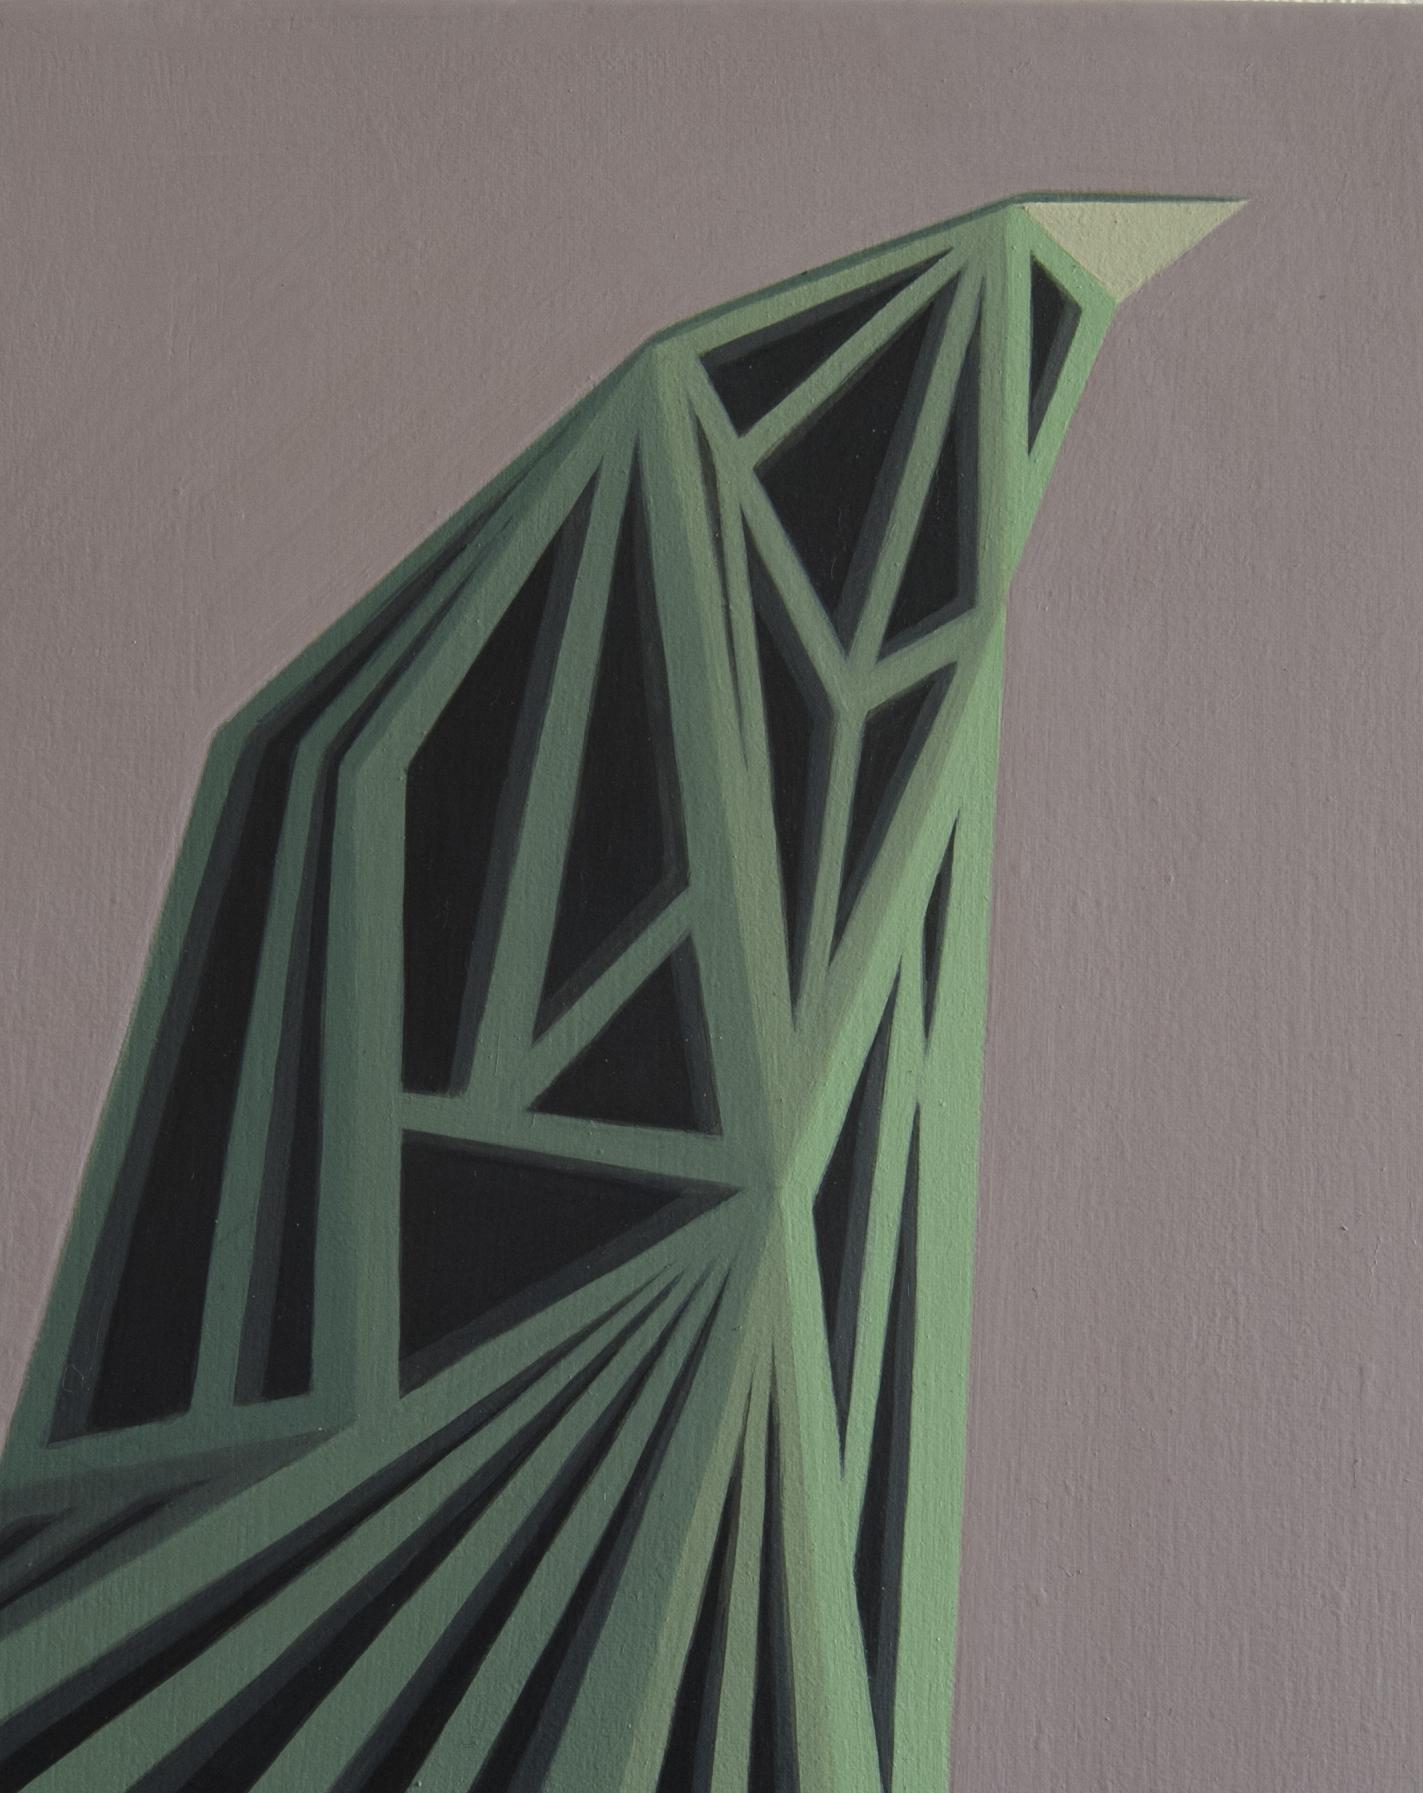 Geometric Painting by Italian Artist Roberto Chessa